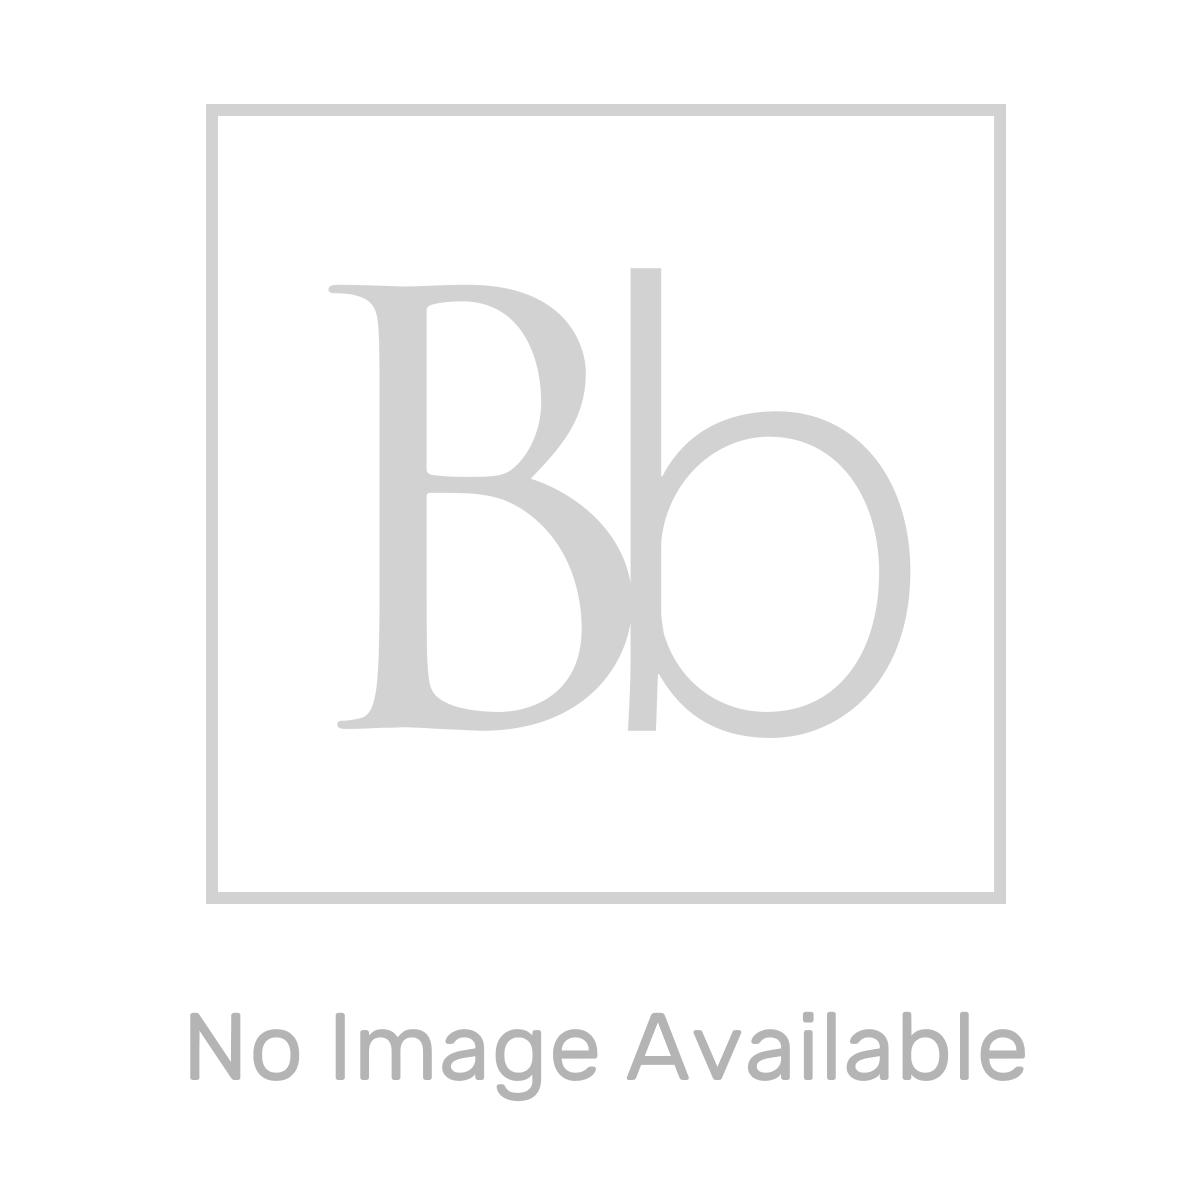 HiB Turbo Inline White Wetroom Extractor Fan